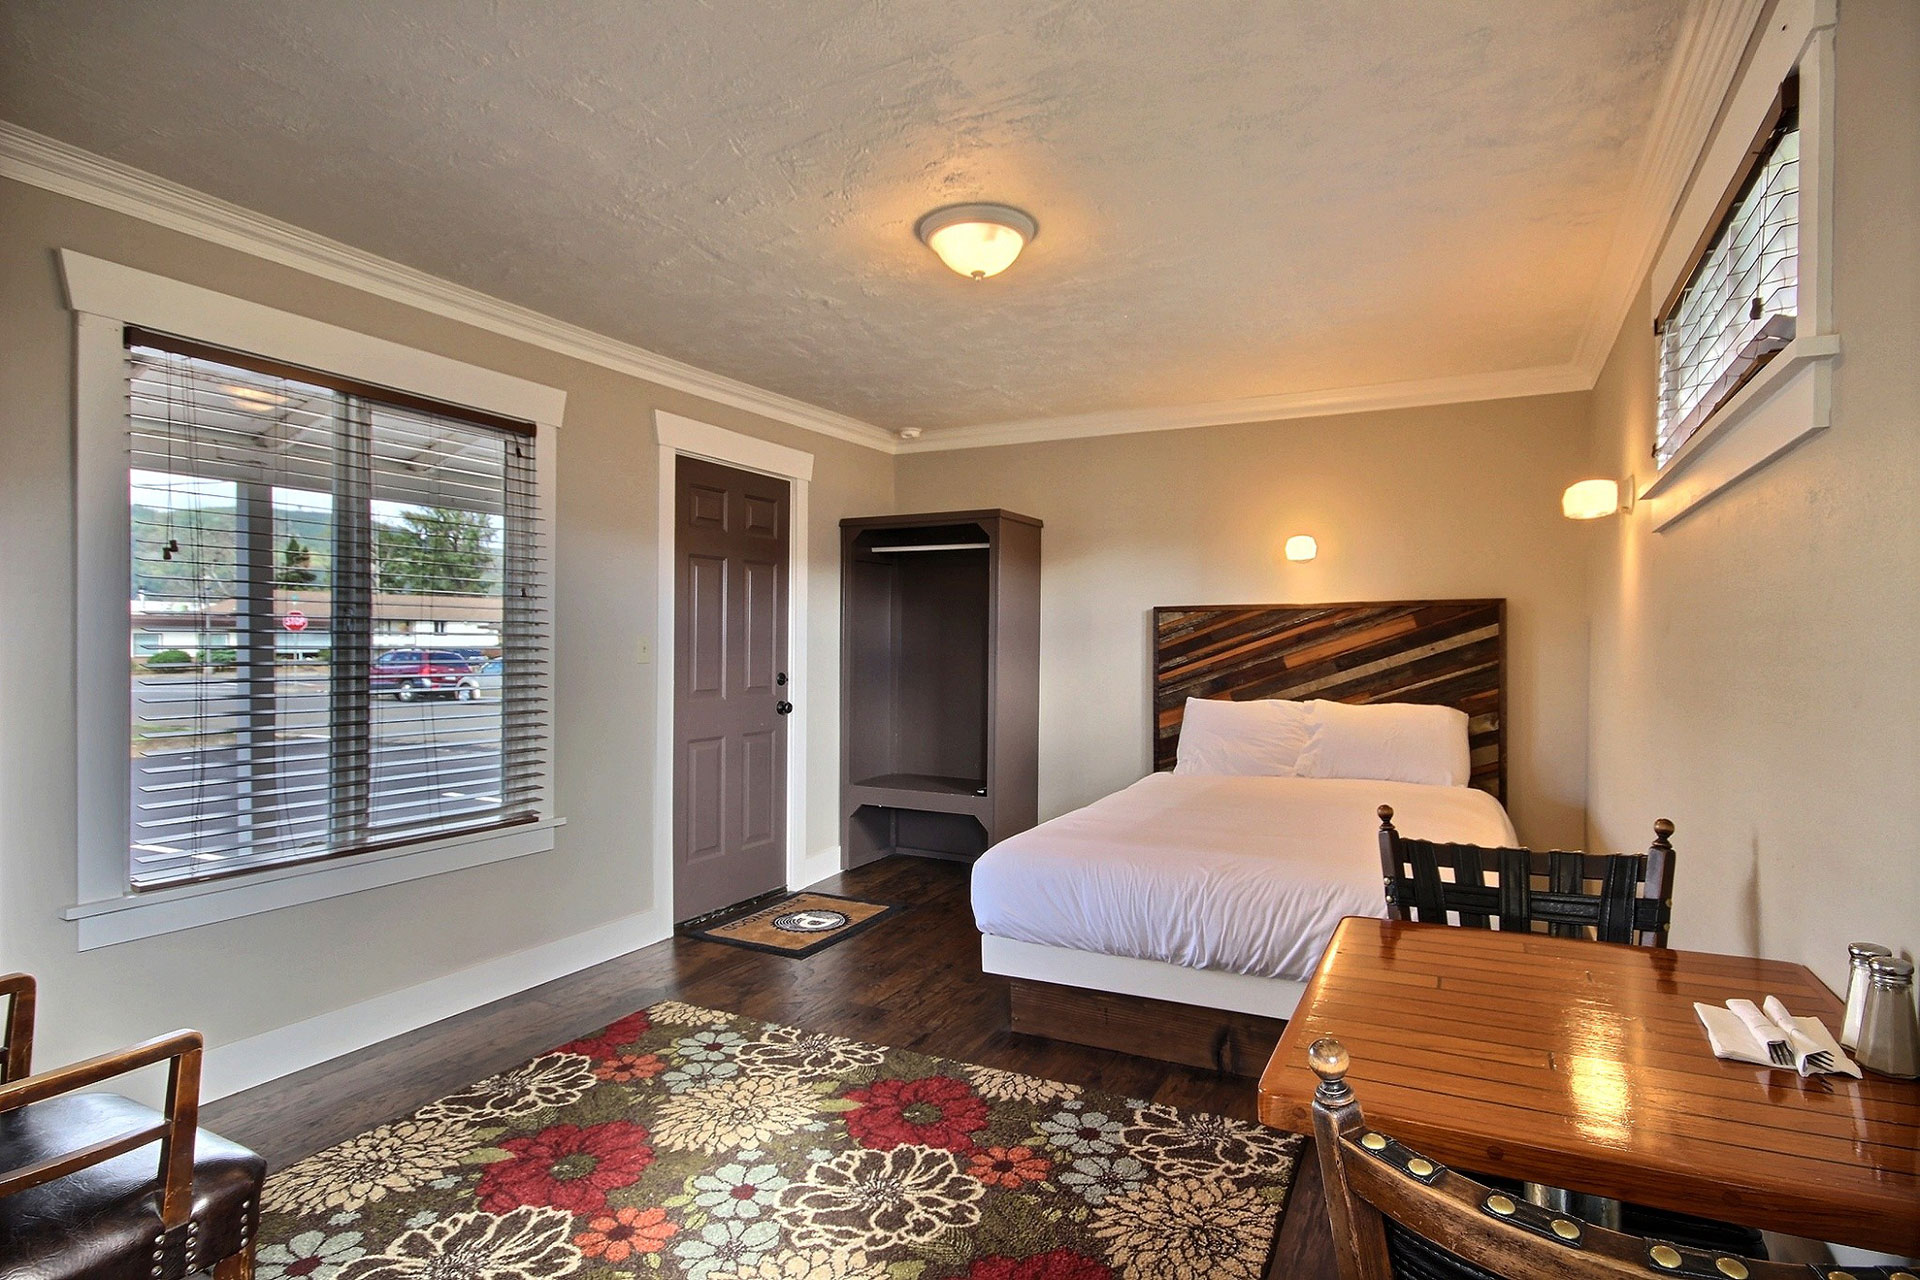 K-9 - Queen Sized Bed, Kitchenette